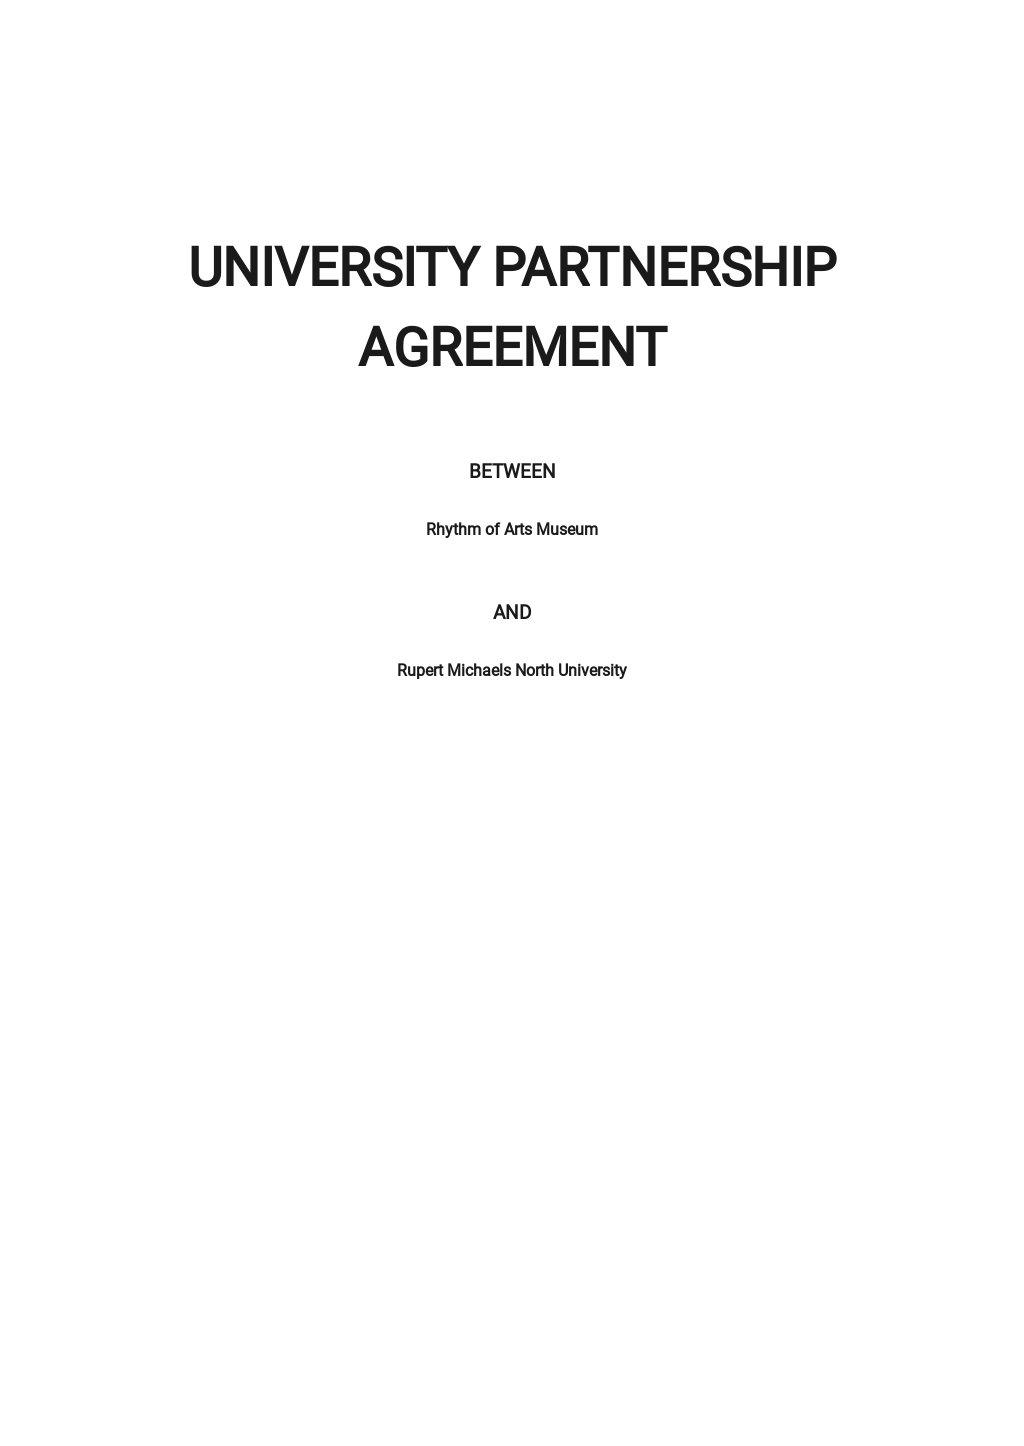 University Partnership Agreement Template.jpe